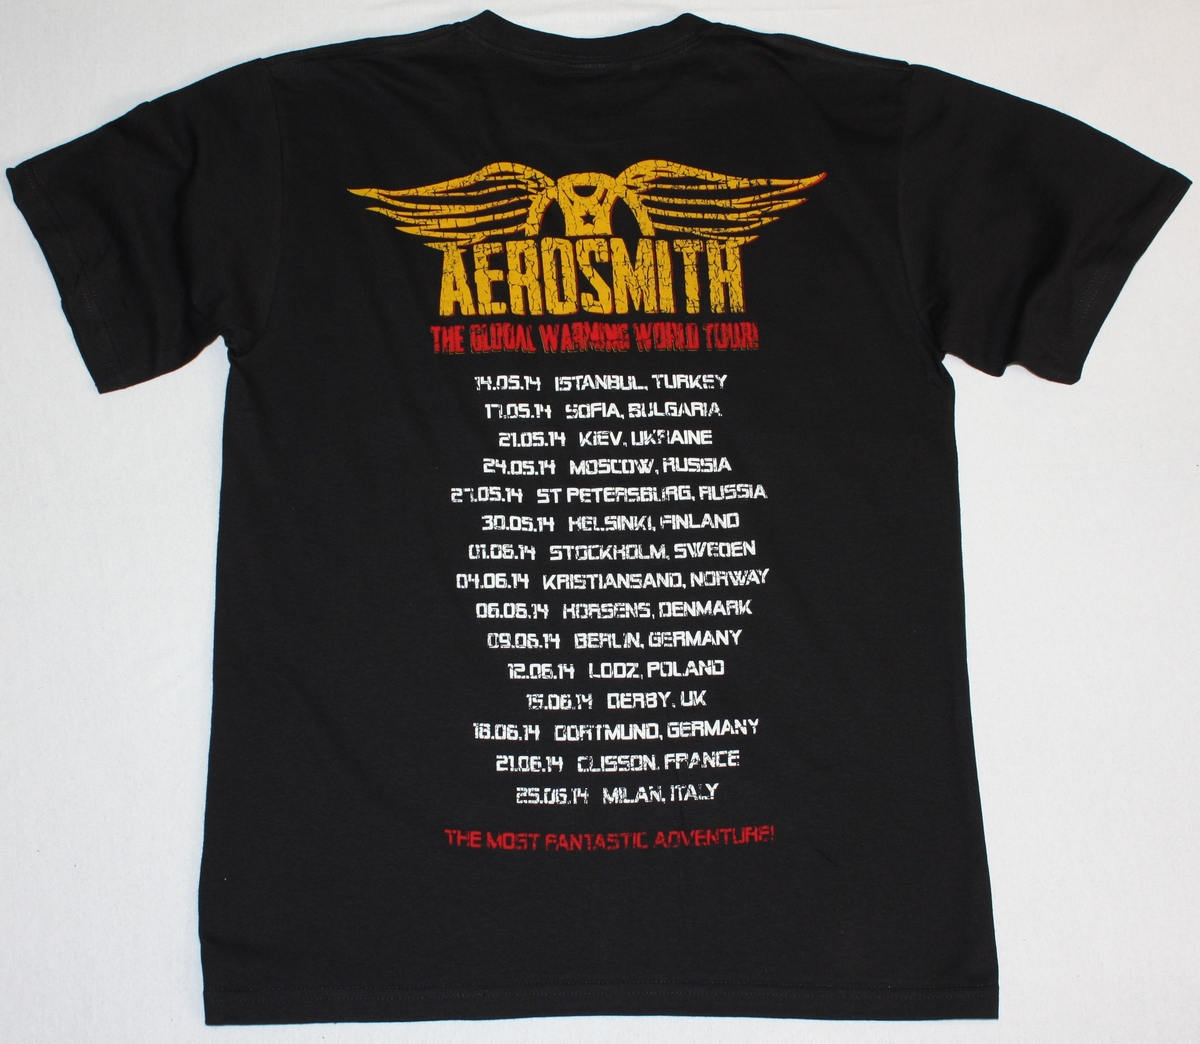 AEROSMITH BAND THE GLOBAL WARMING TOUR 2014 NEW BLACK TSHIRT